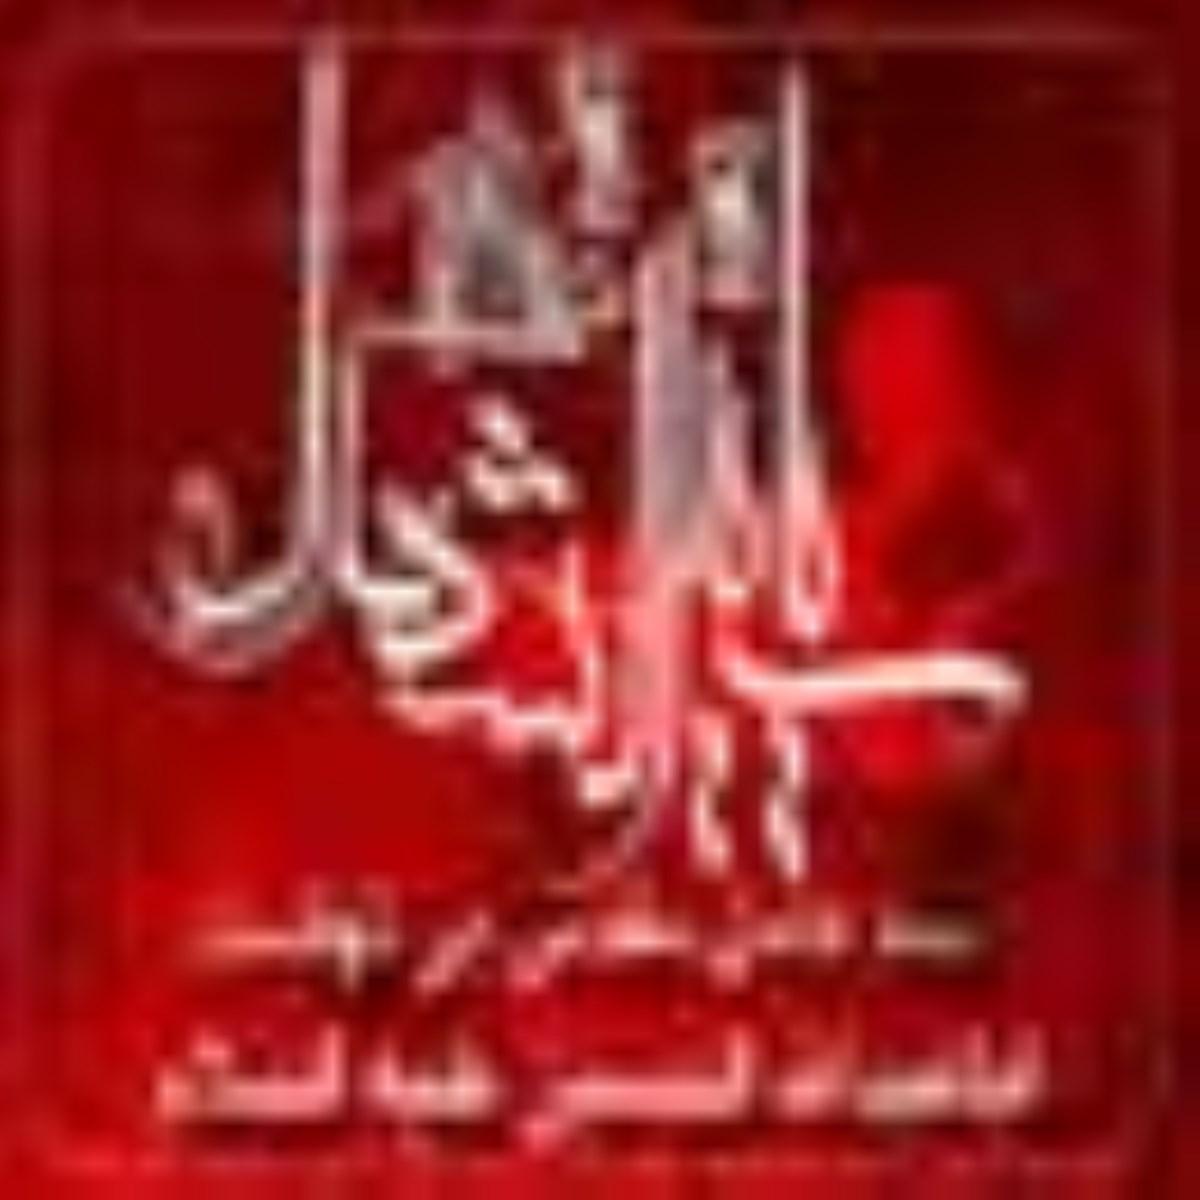 سه عامل مقدس در نهضت اباعبدالله الحسین (علیه السلام)